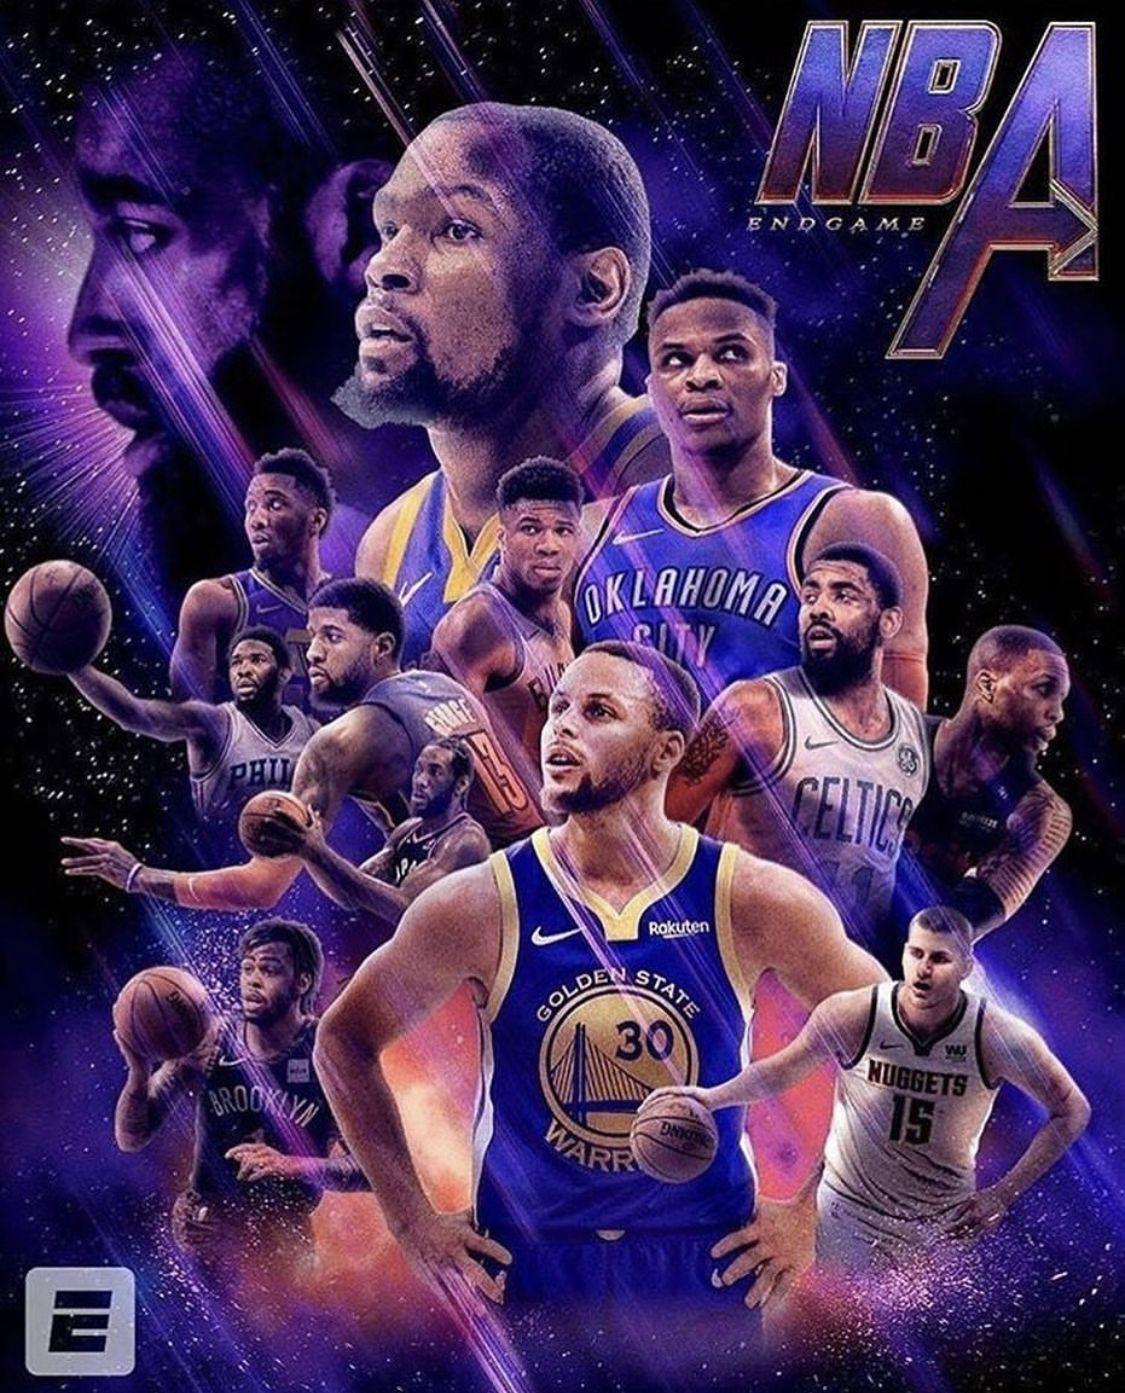 Pin By Calvin Bradbury On Basketball Wallpaper Funny Basketball Memes Basketball Pictures Kyrie Irving Celtics